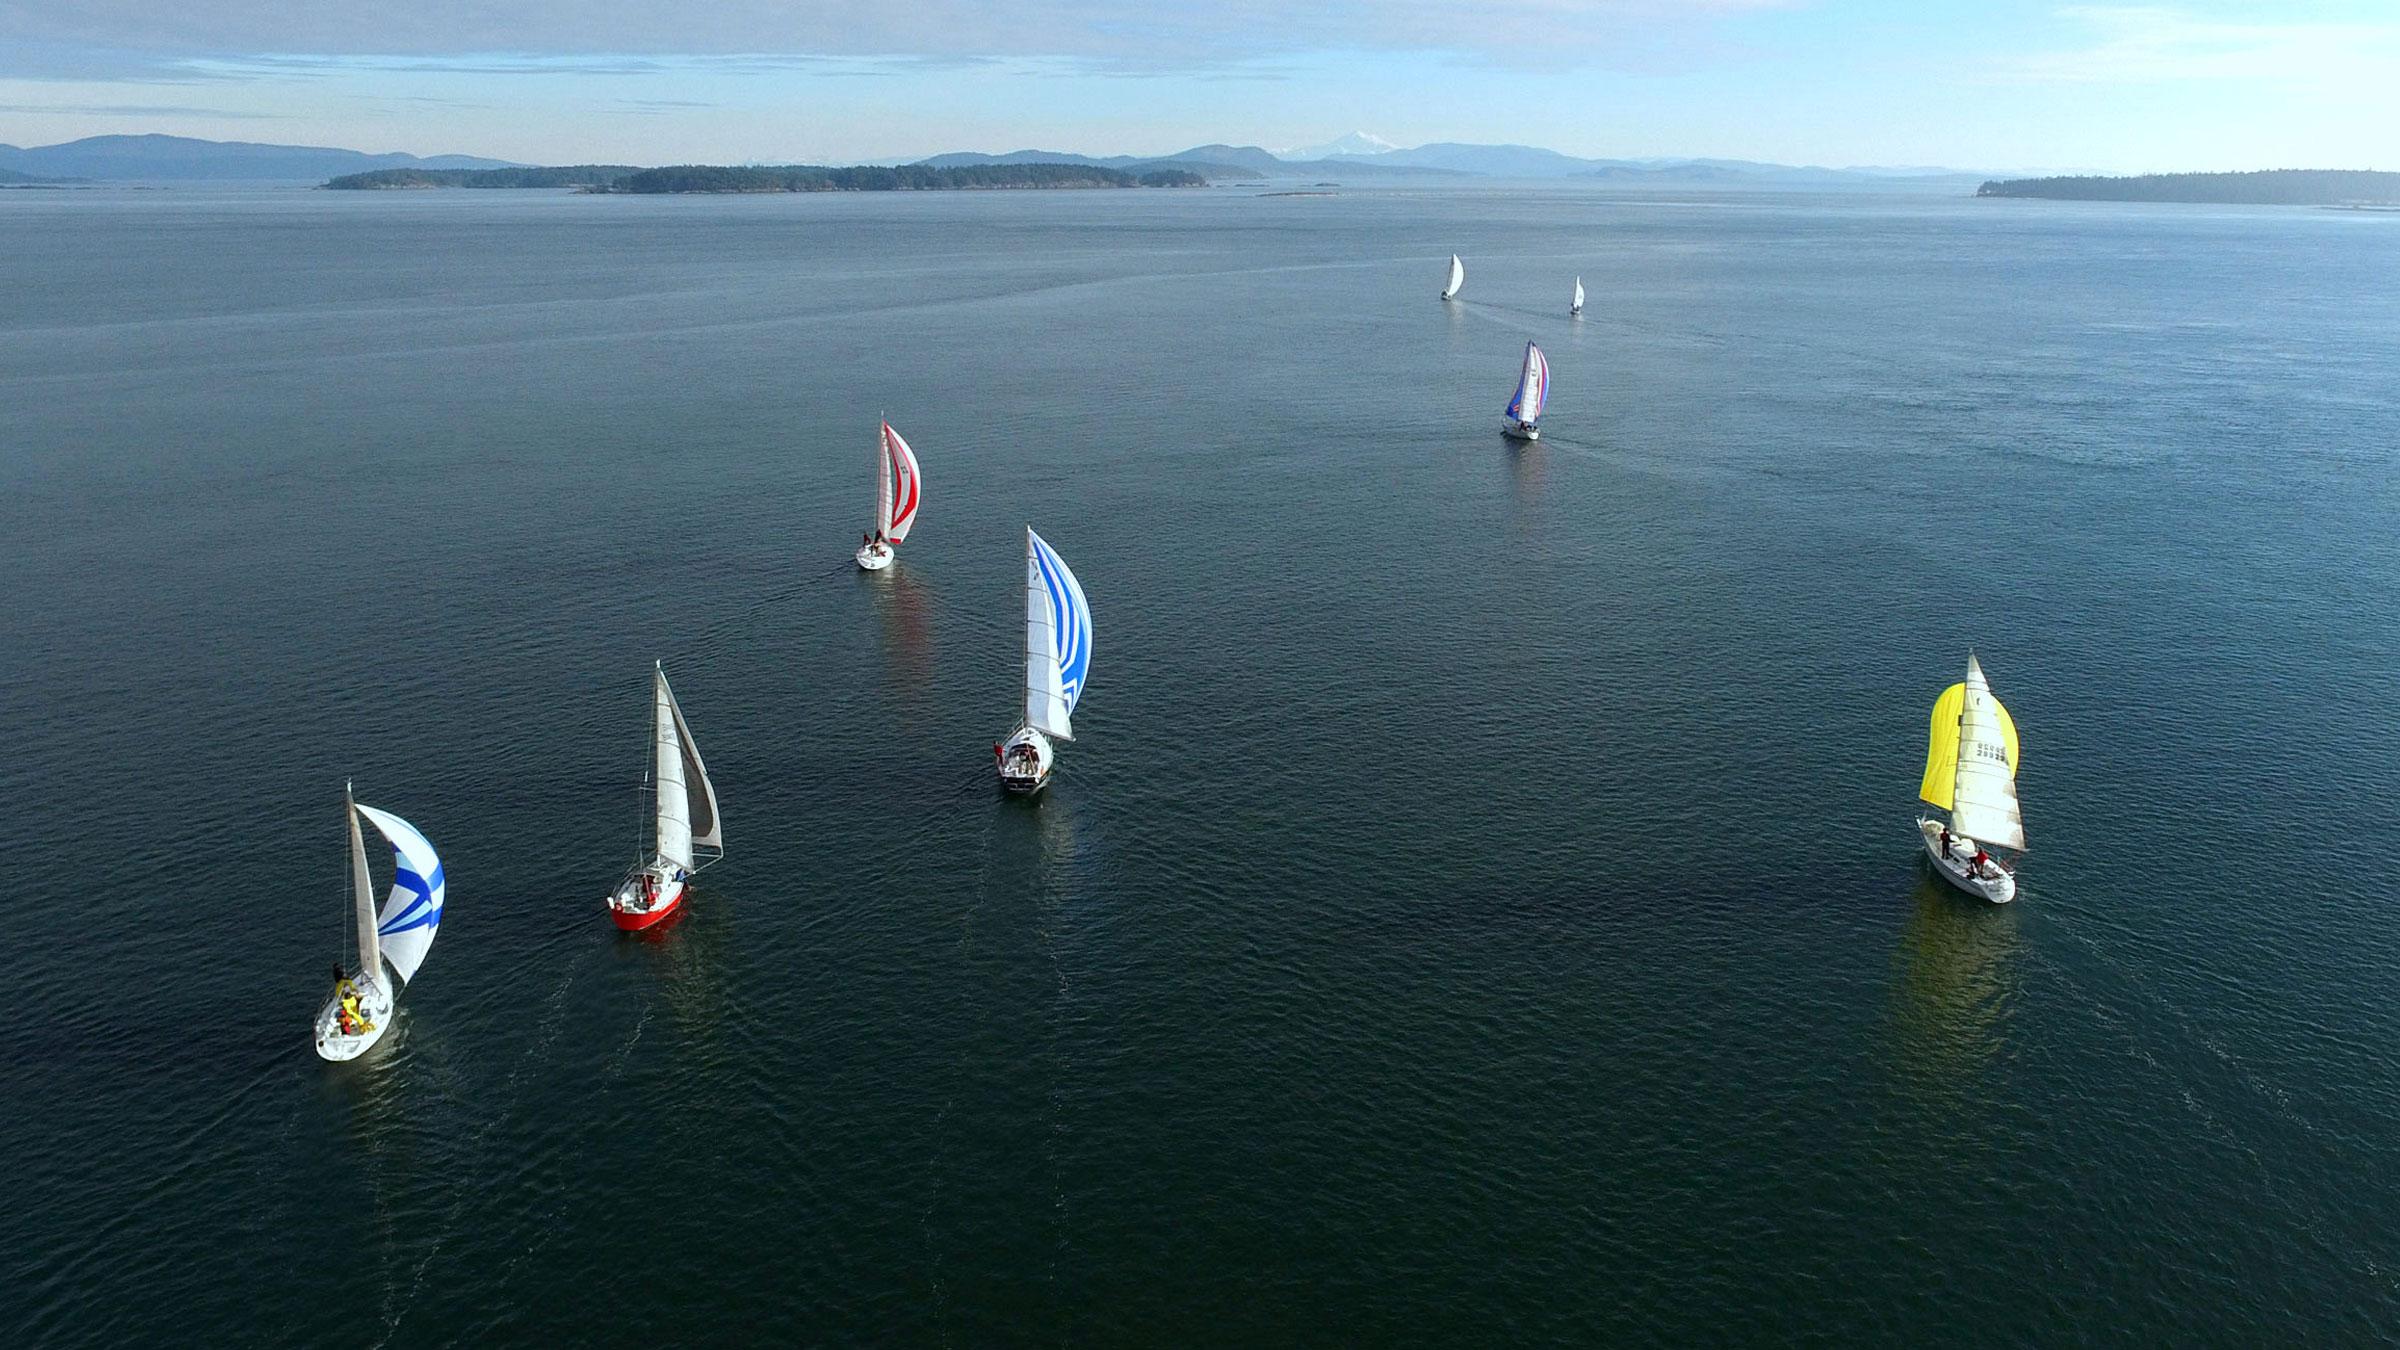 Blackline Patos Island Race